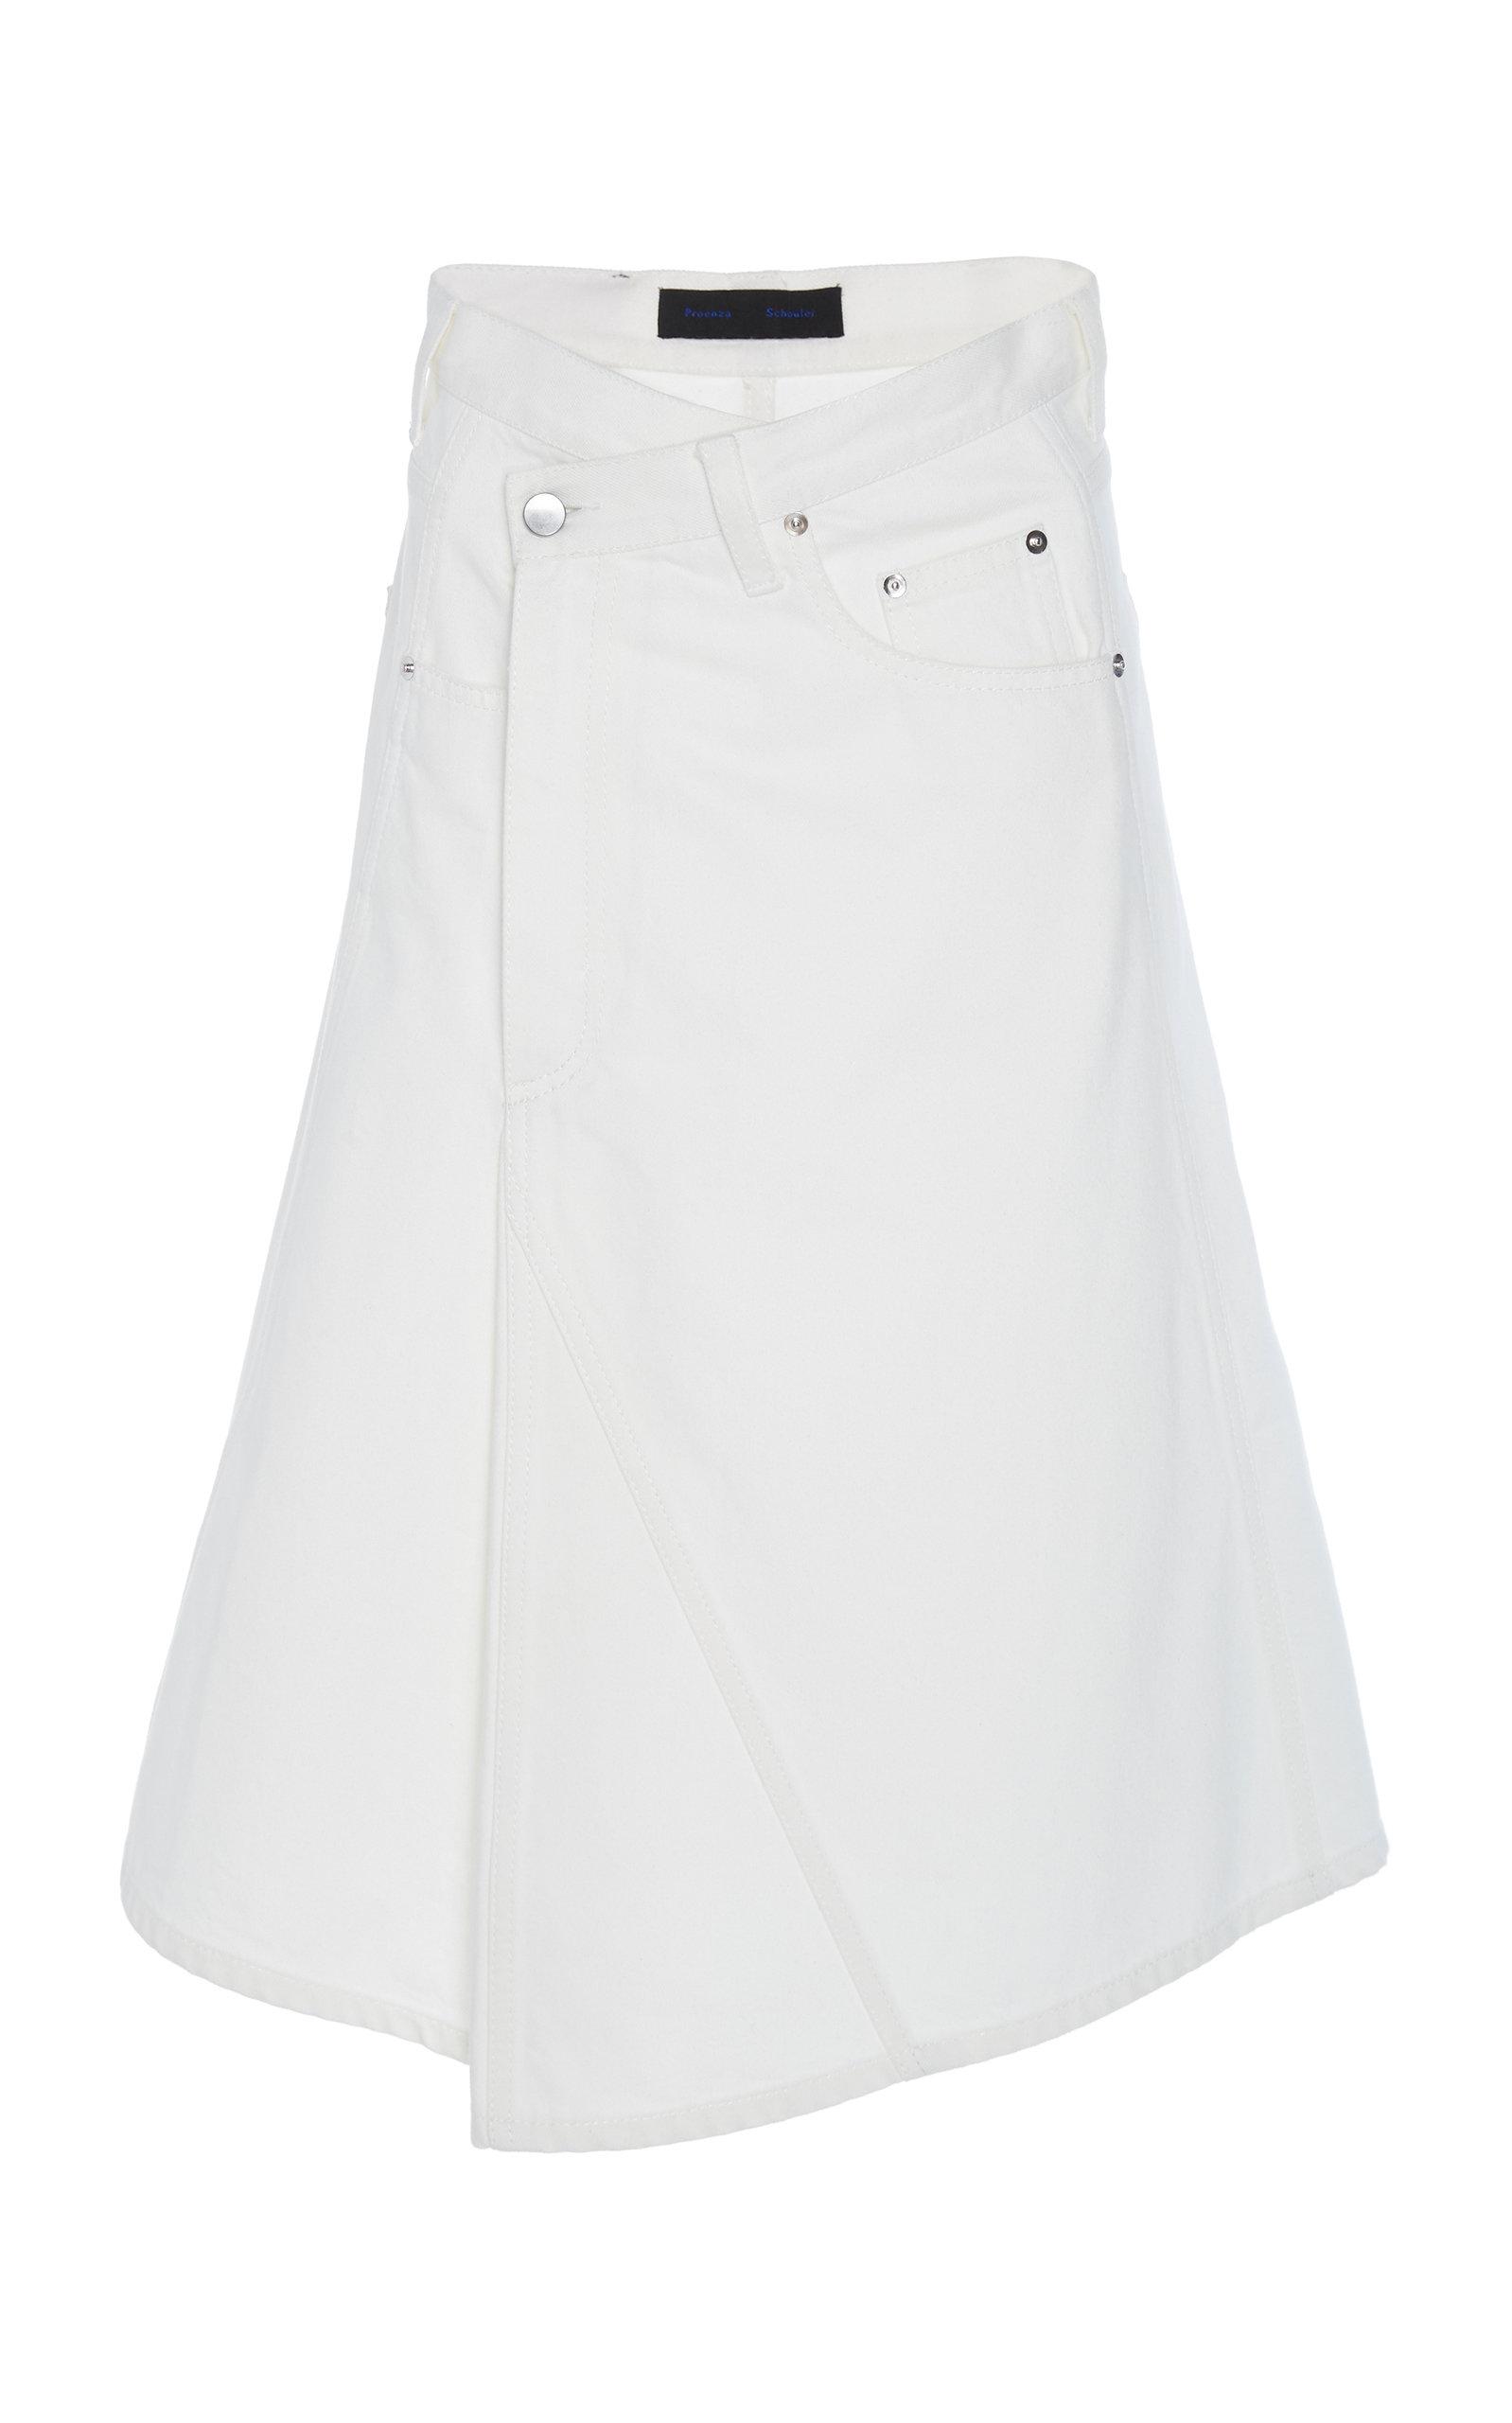 afb99a0ebfa11b large proenza-schouler-white-asymmetric-denim-midi-skirt.jpg